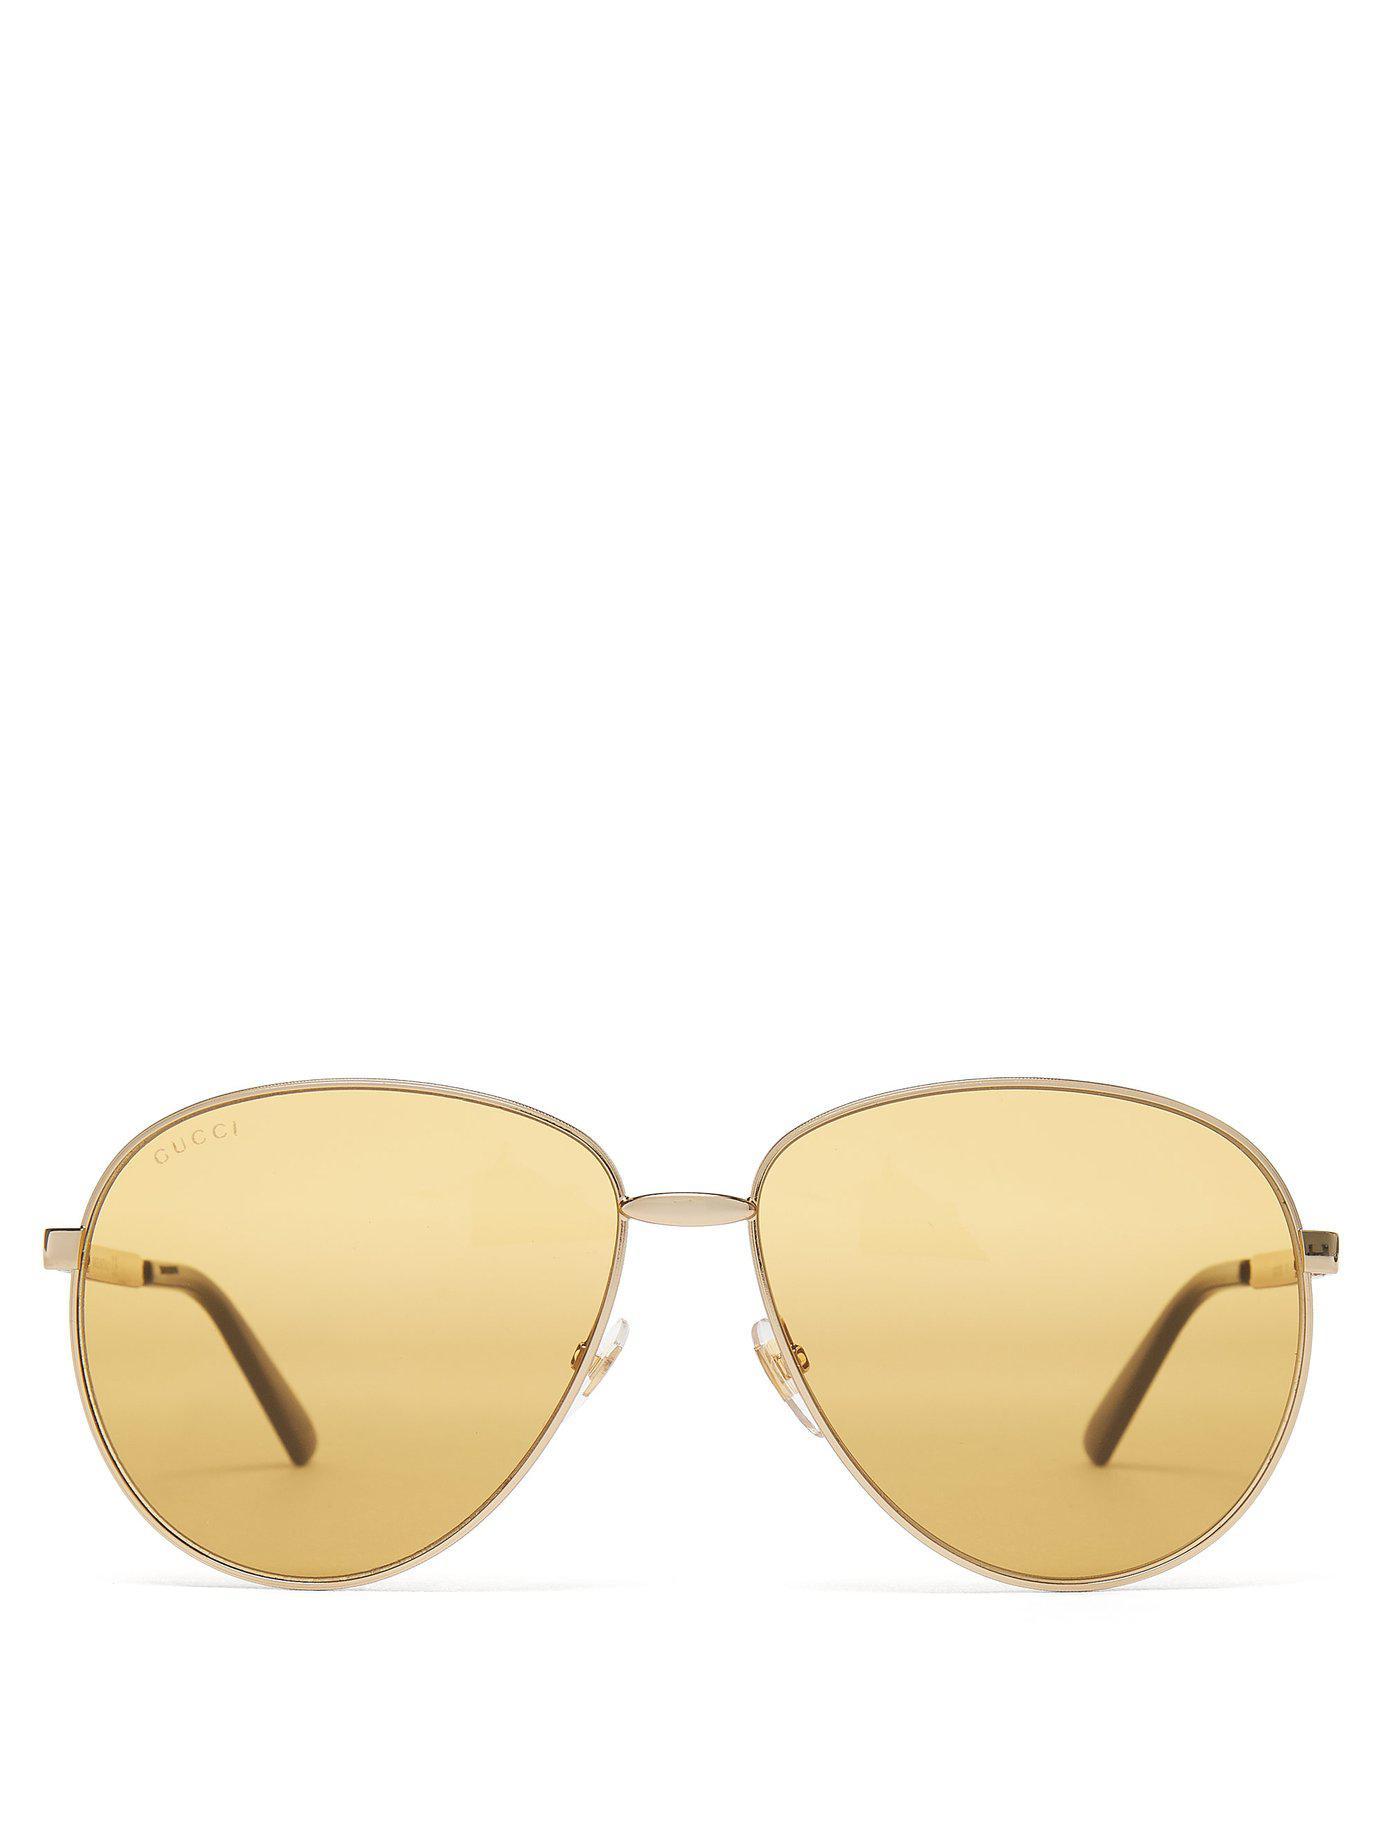 035ad9e3446 Gucci - Metallic Aviator Frame Metal Sunglasses for Men - Lyst. View  fullscreen